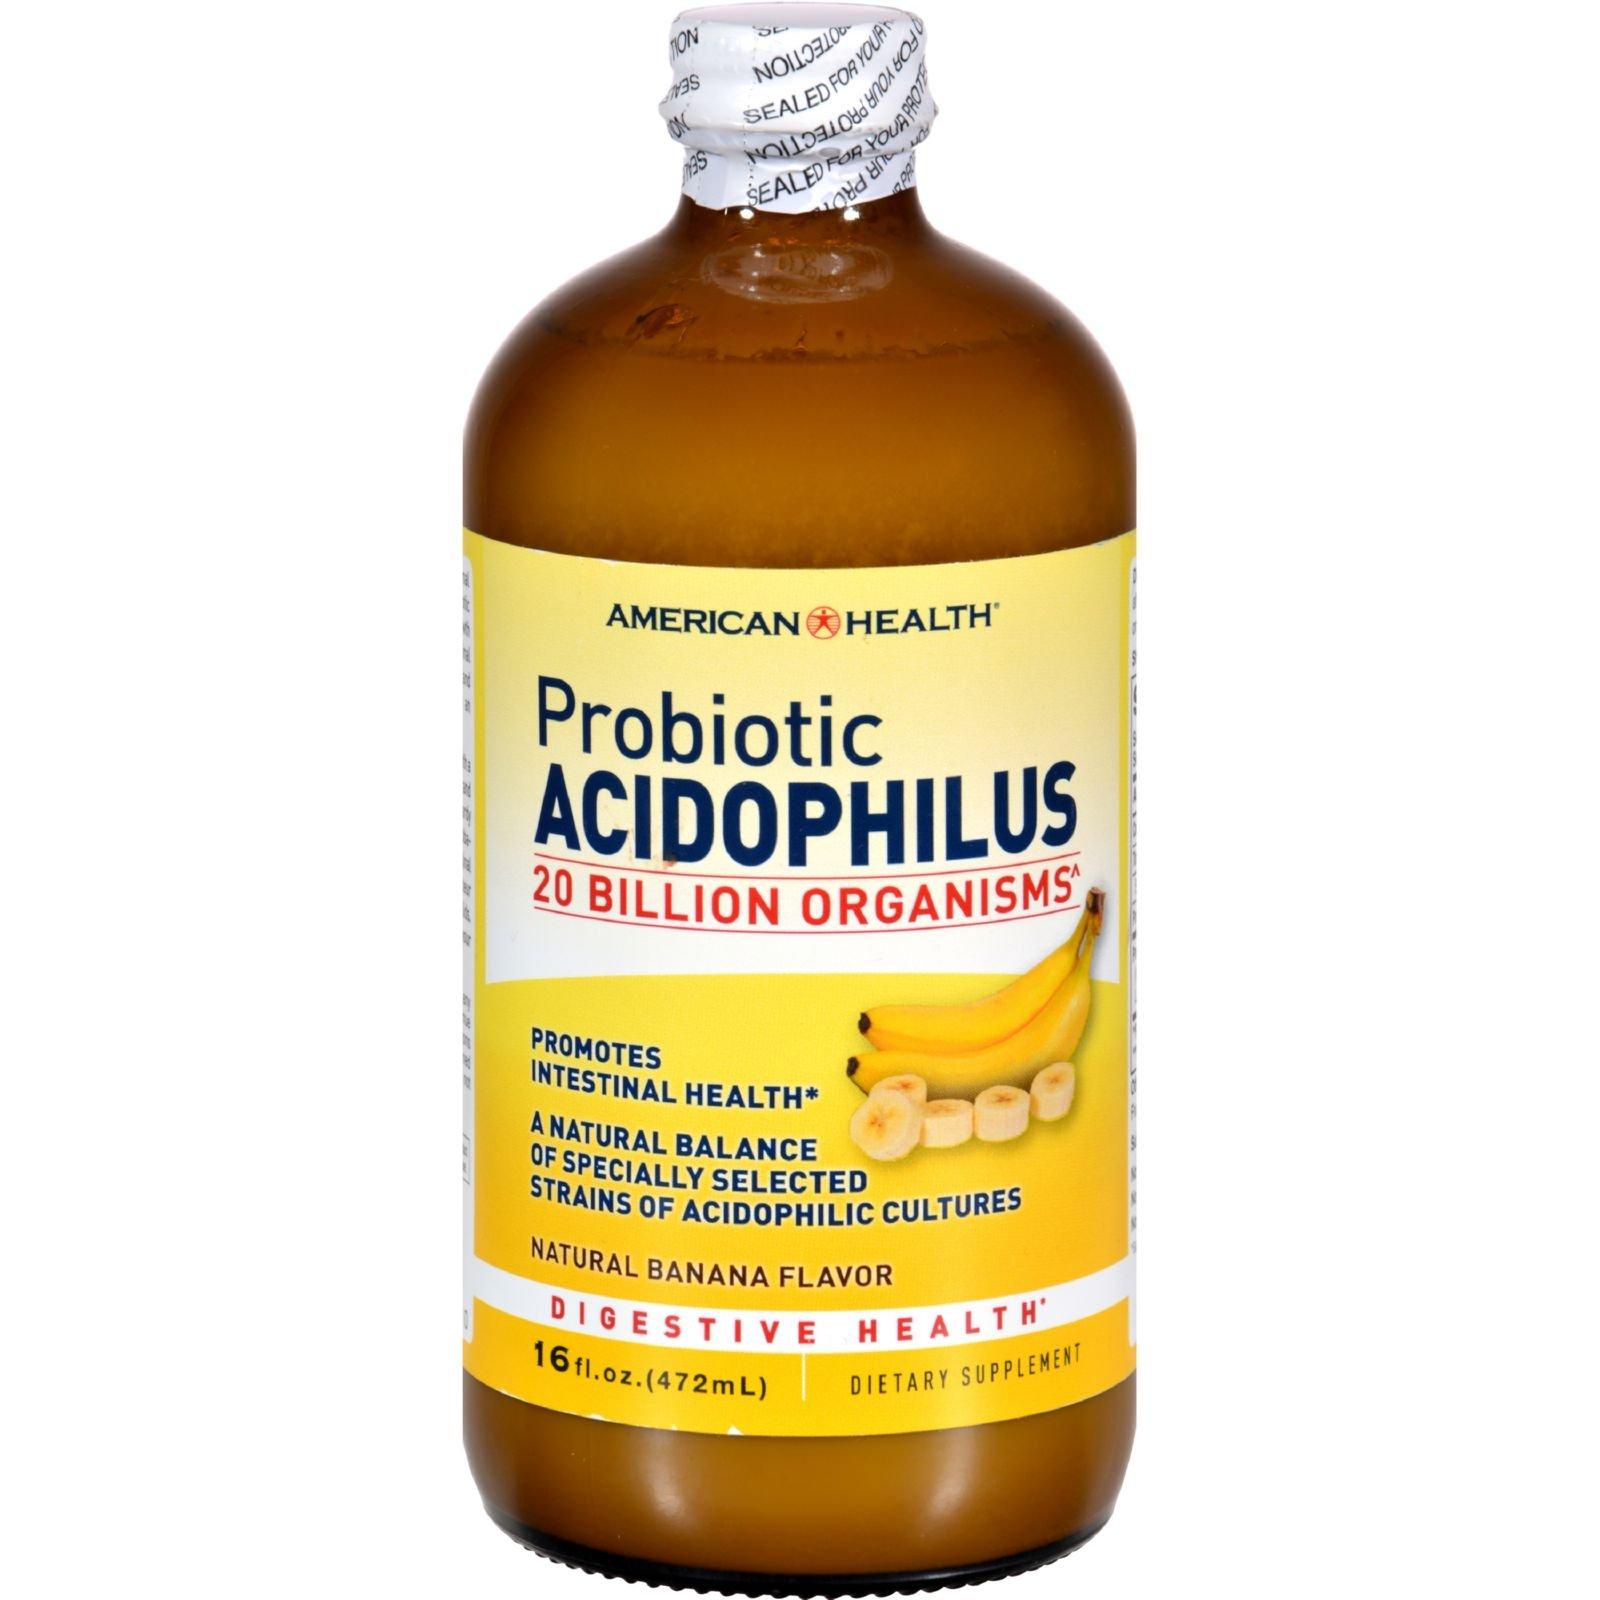 4 Pack of American Health Probiotic Acidophilus Banana - 16 fl oz - - -